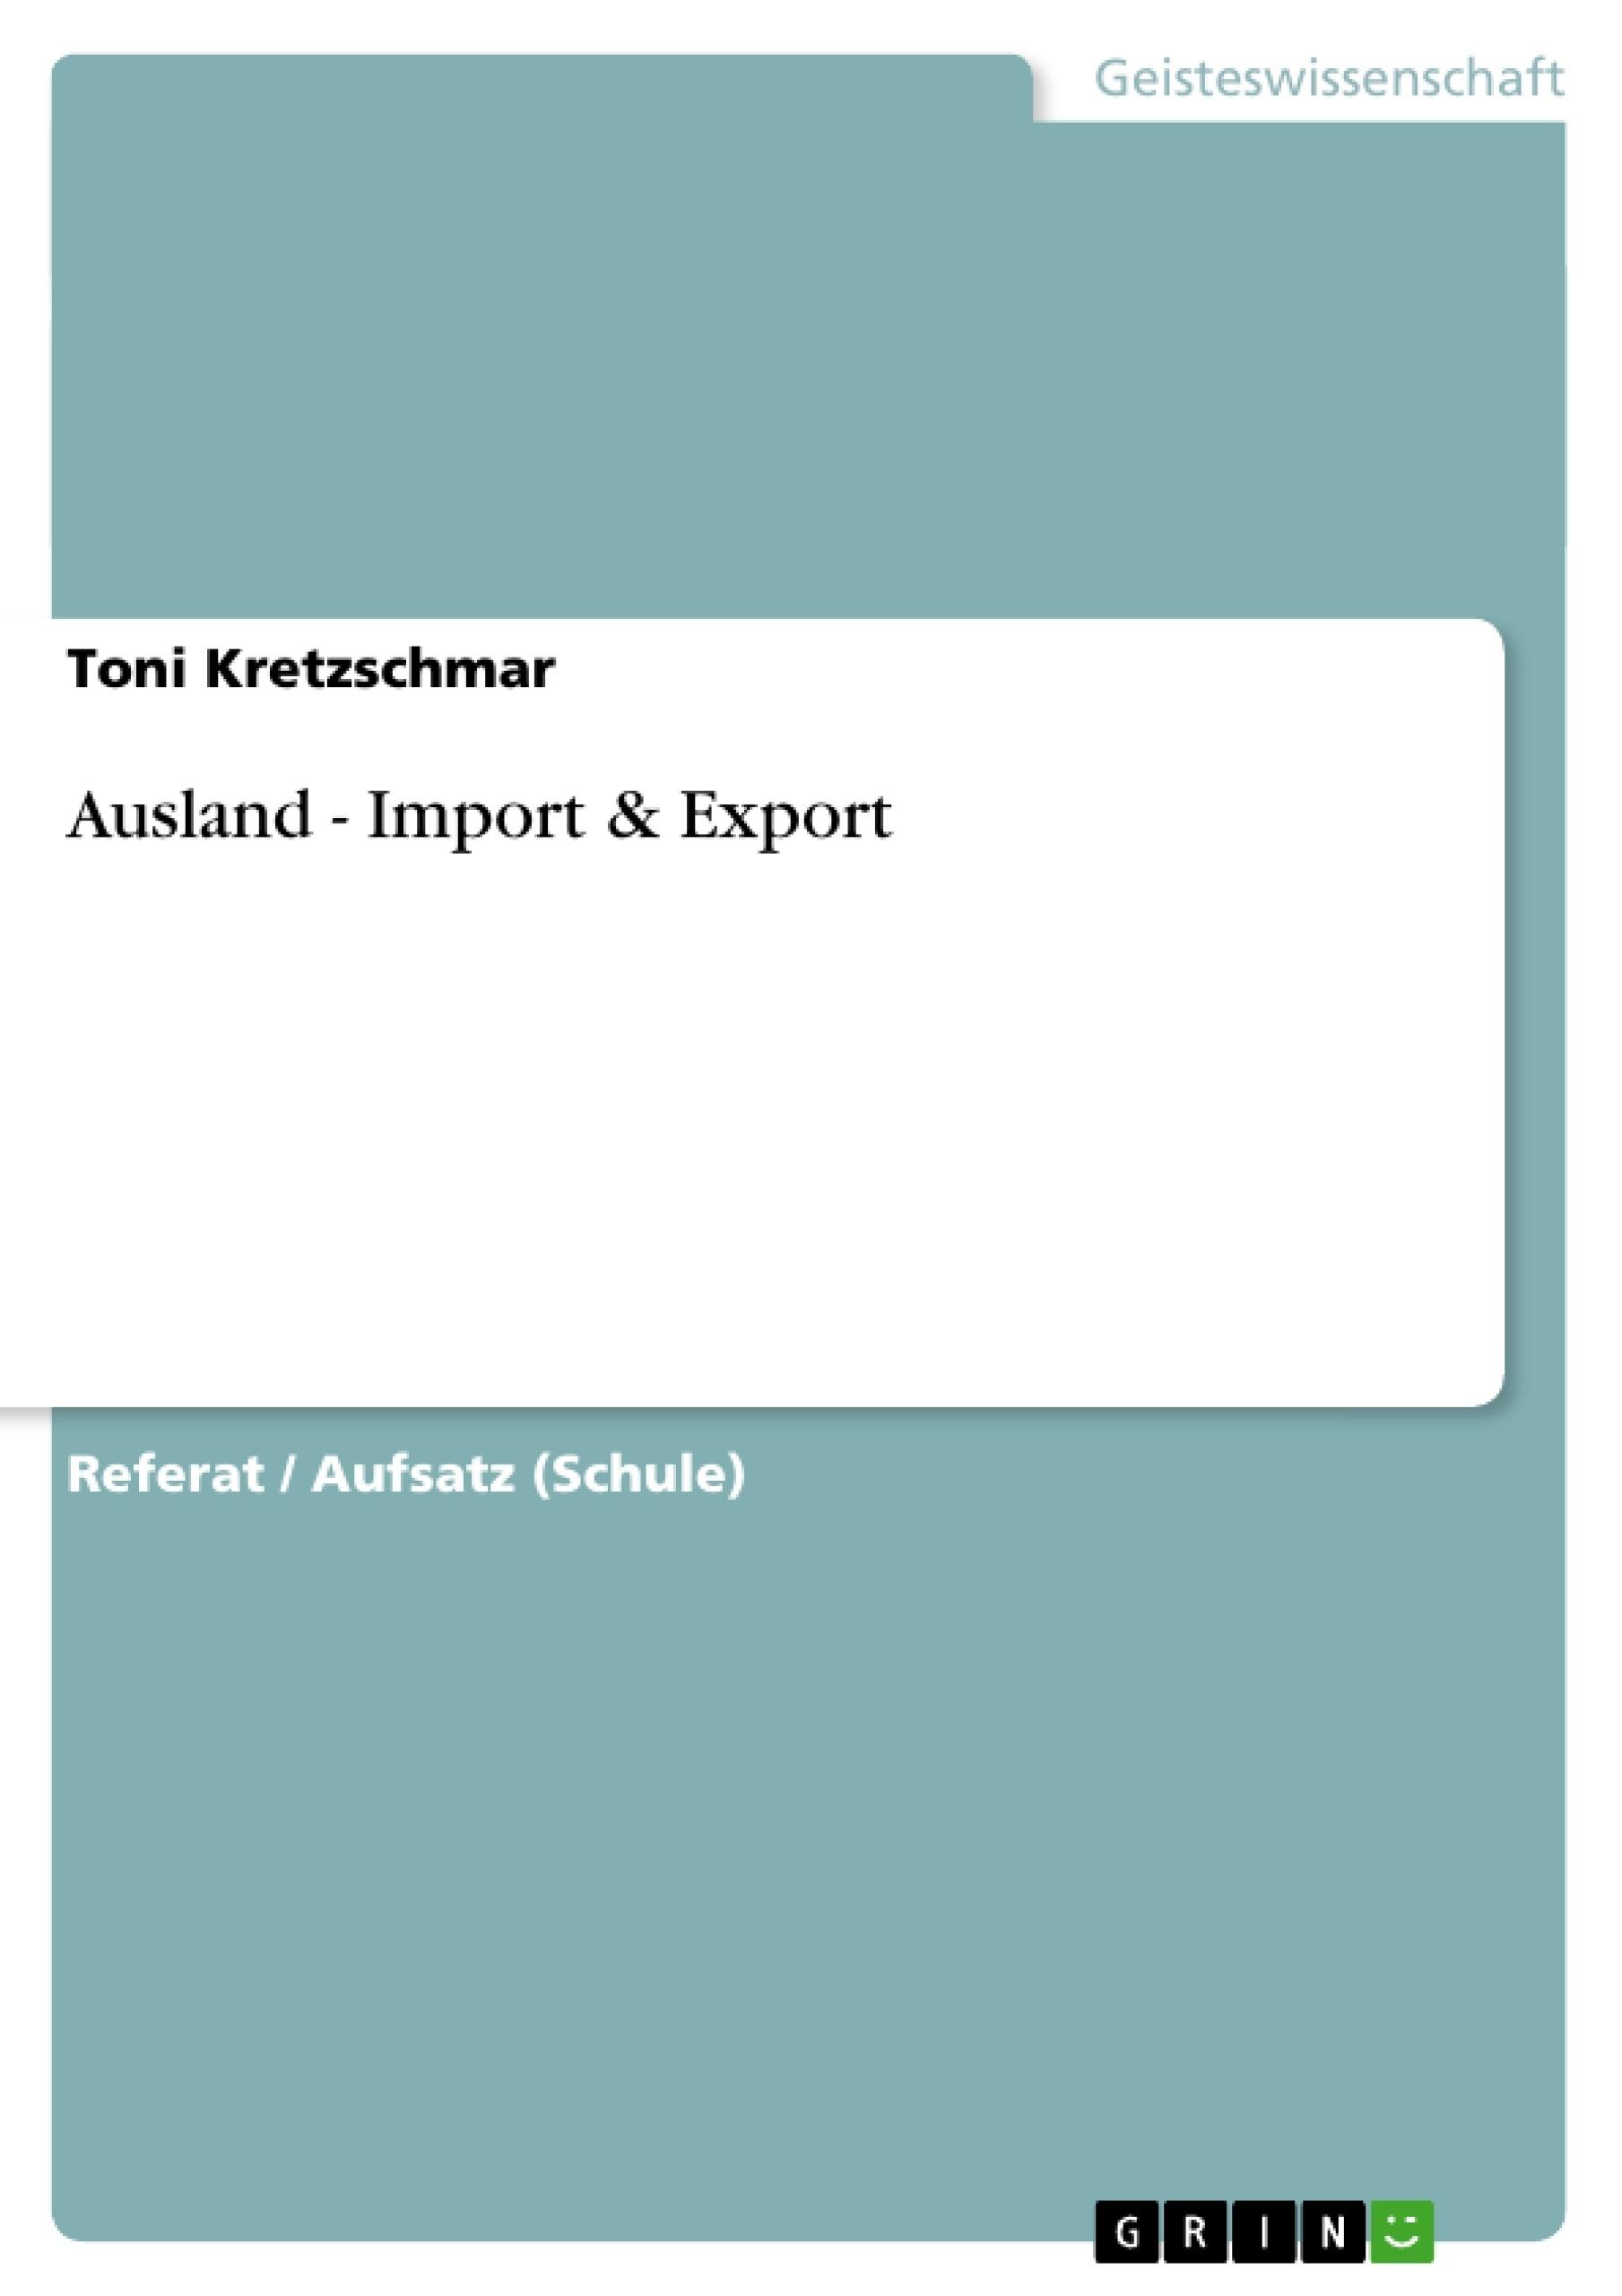 Titel: Ausland - Import & Export